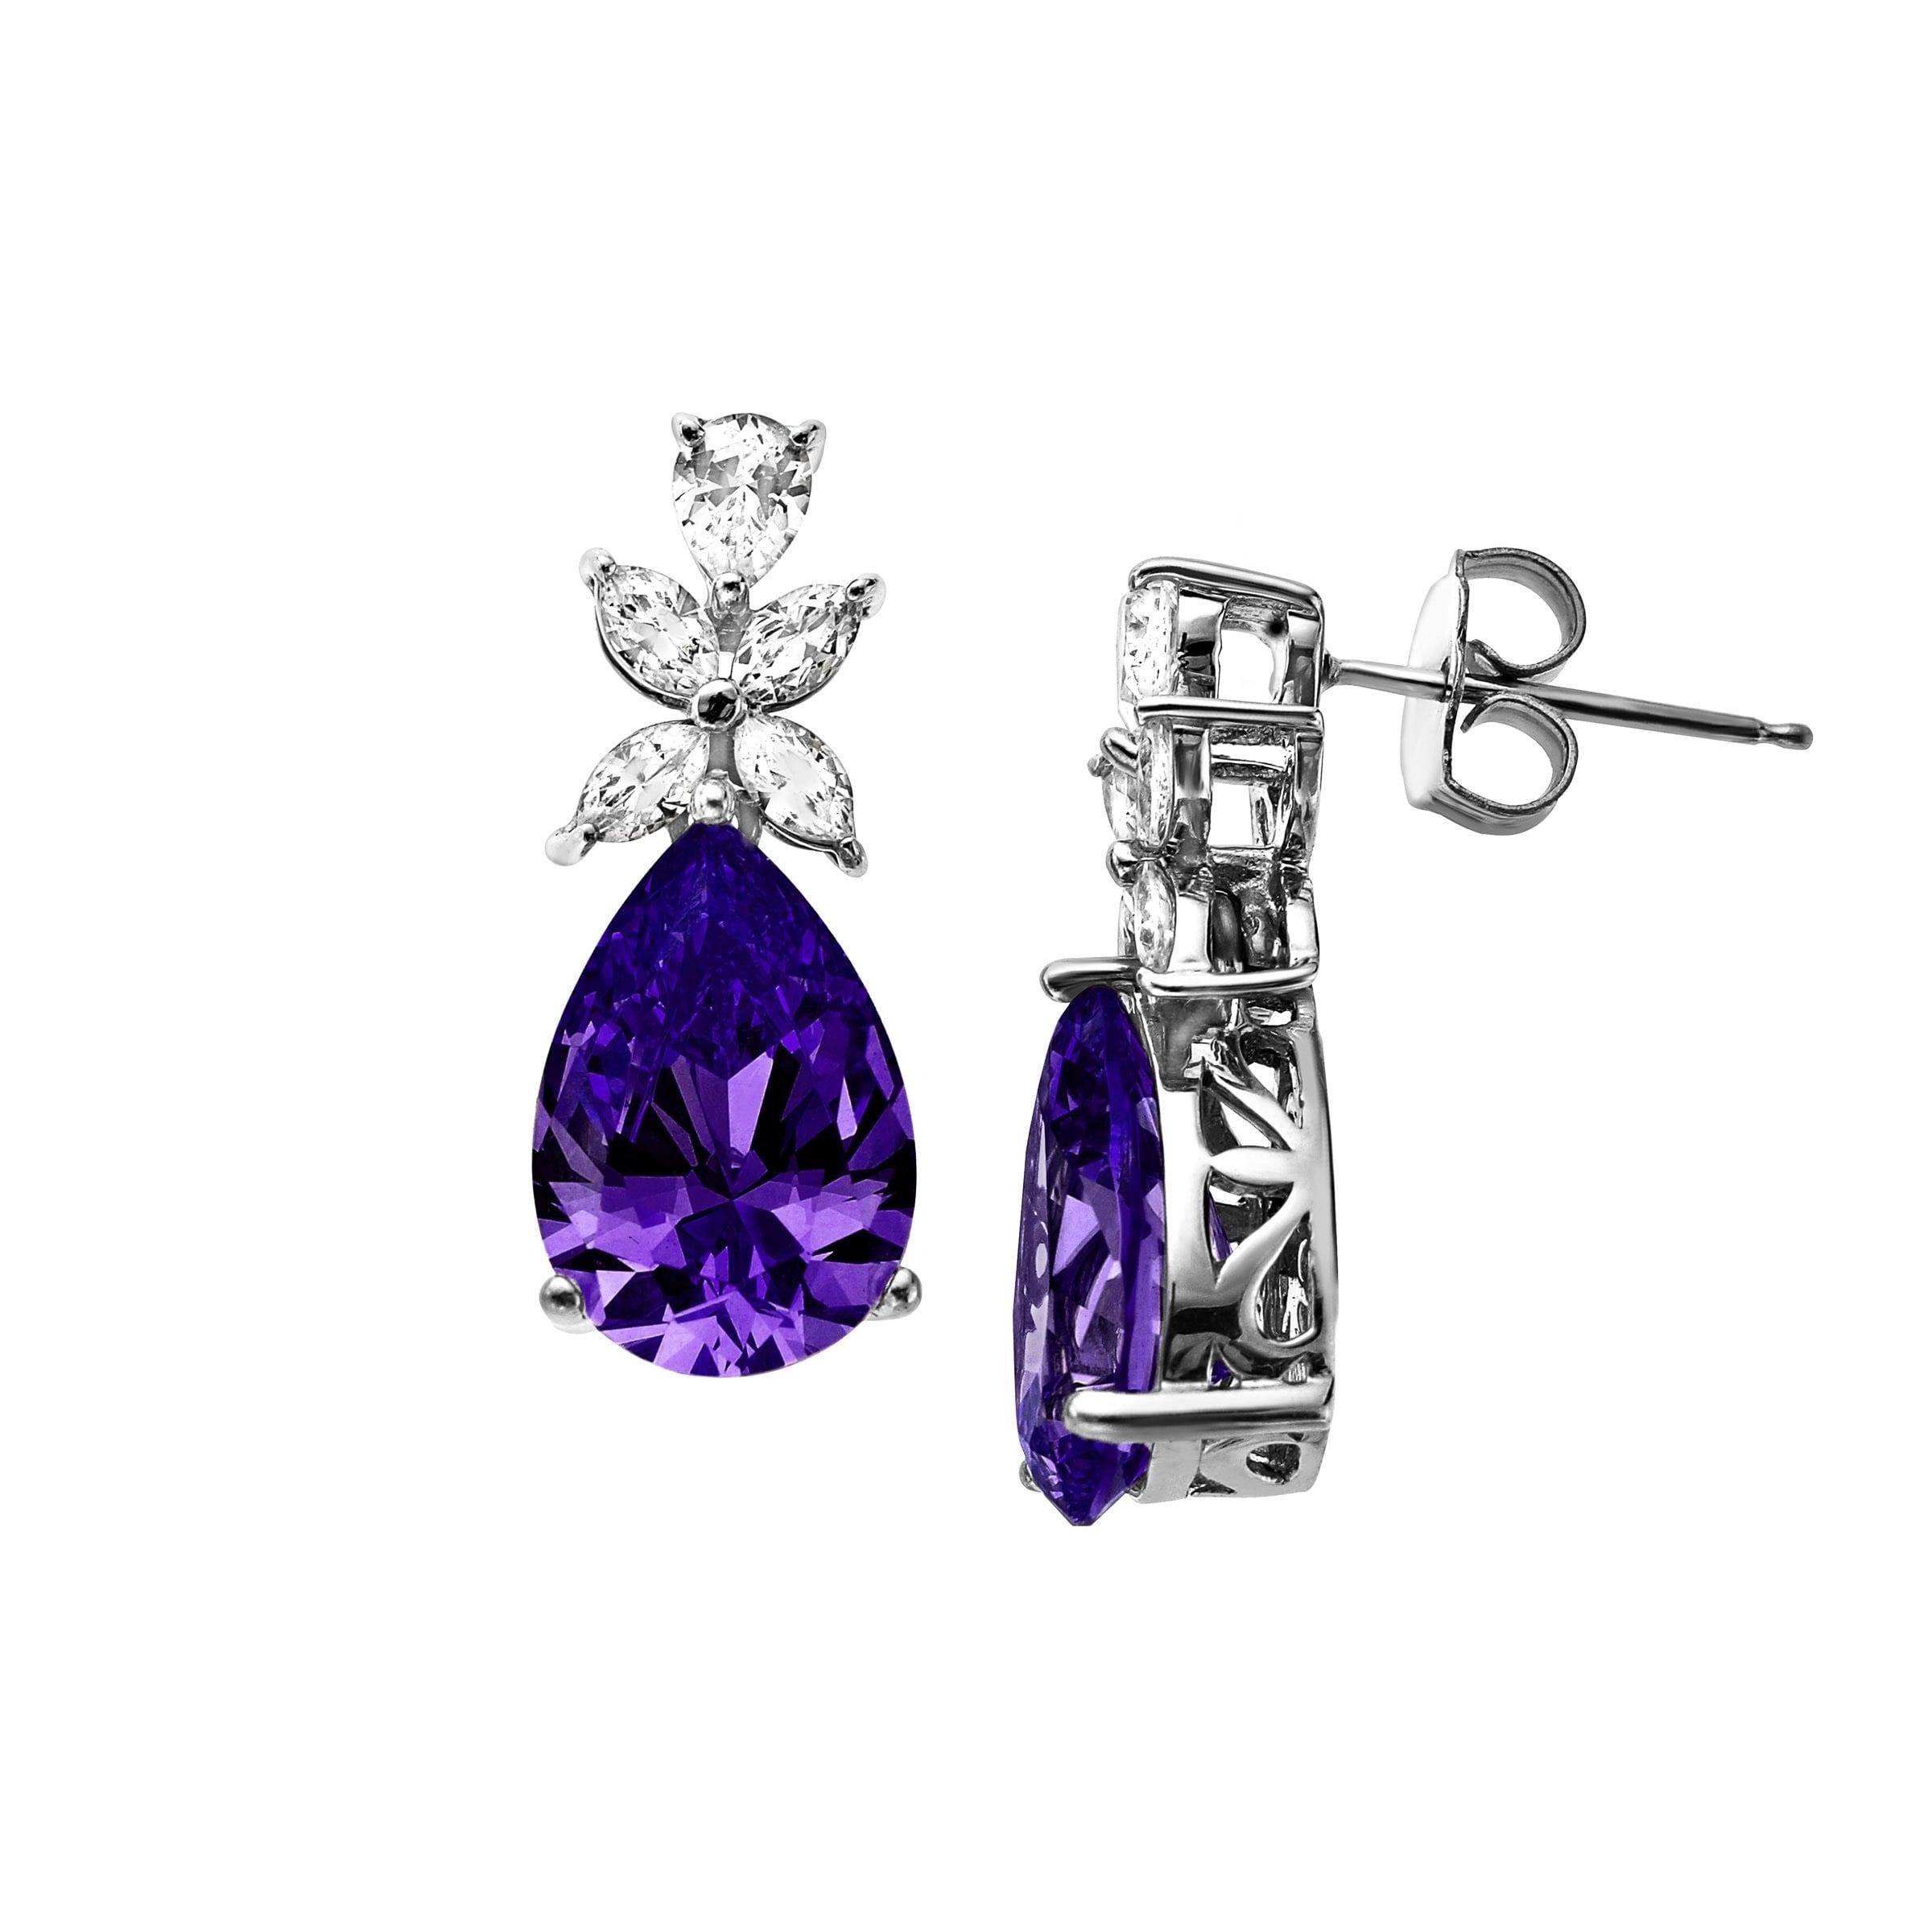 143caa90b Shop Teardrop Earrings with Violet Swarovski Zirconia in Sterling Silver -  Purple - Ships To Canada - Overstock - 13885734